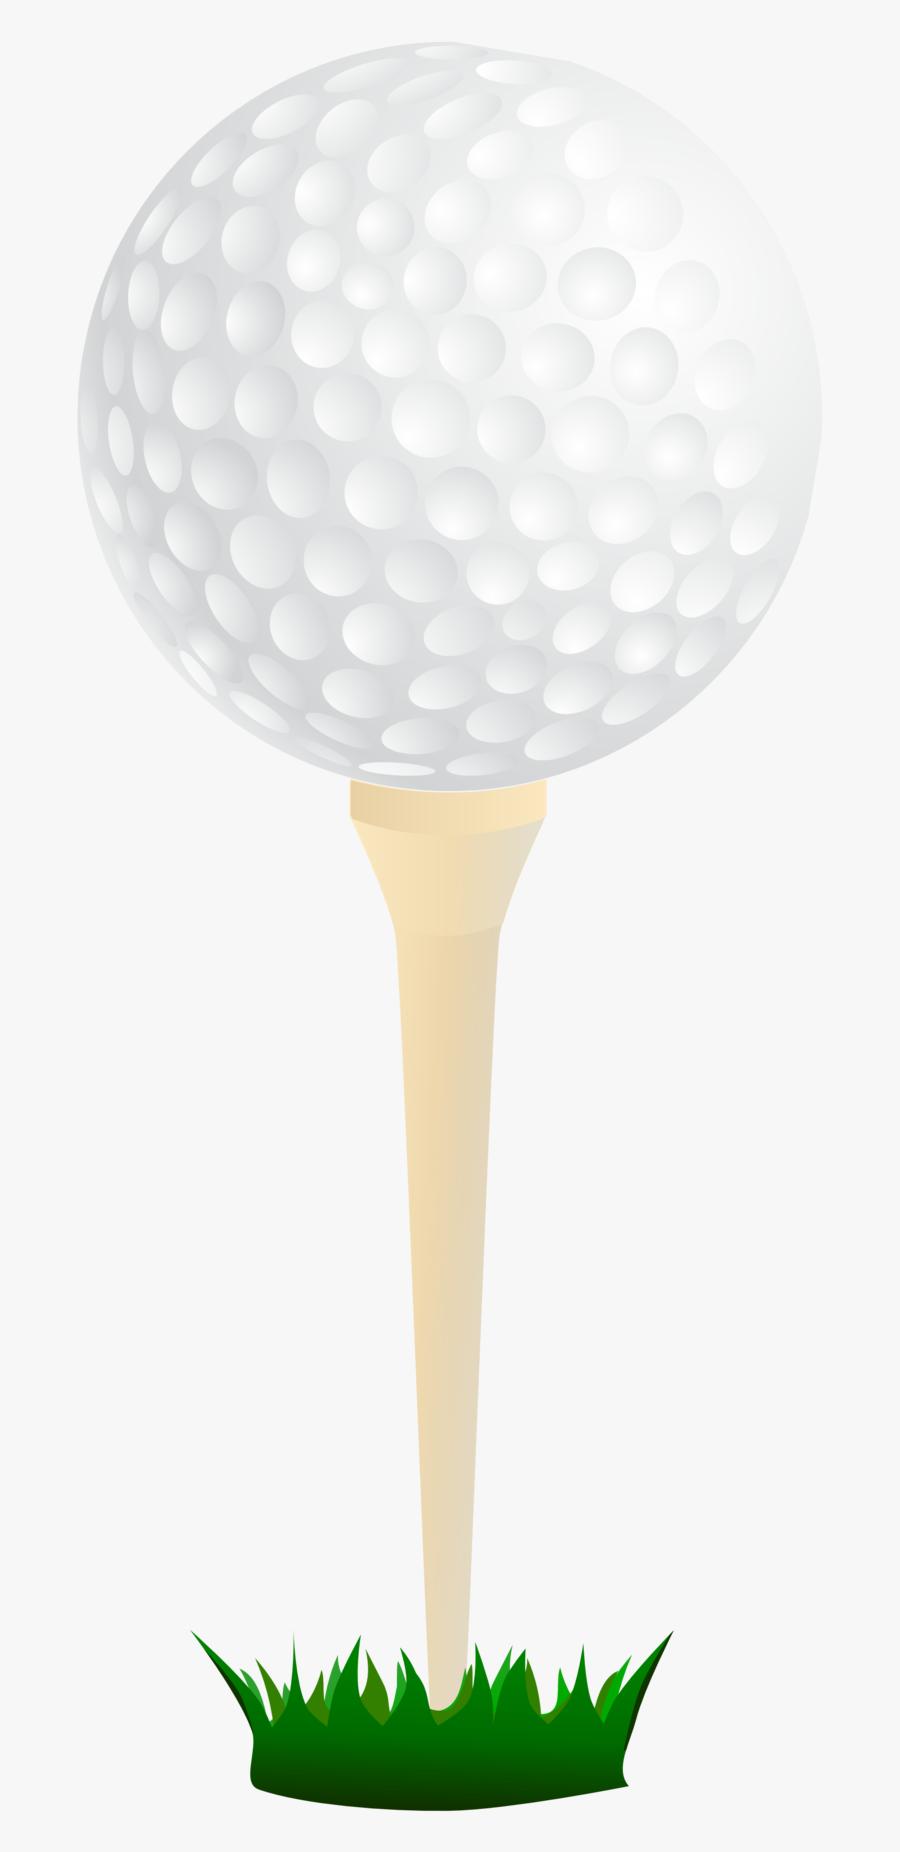 Golf Ball And Tee Clipart Transparent, Transparent Clipart